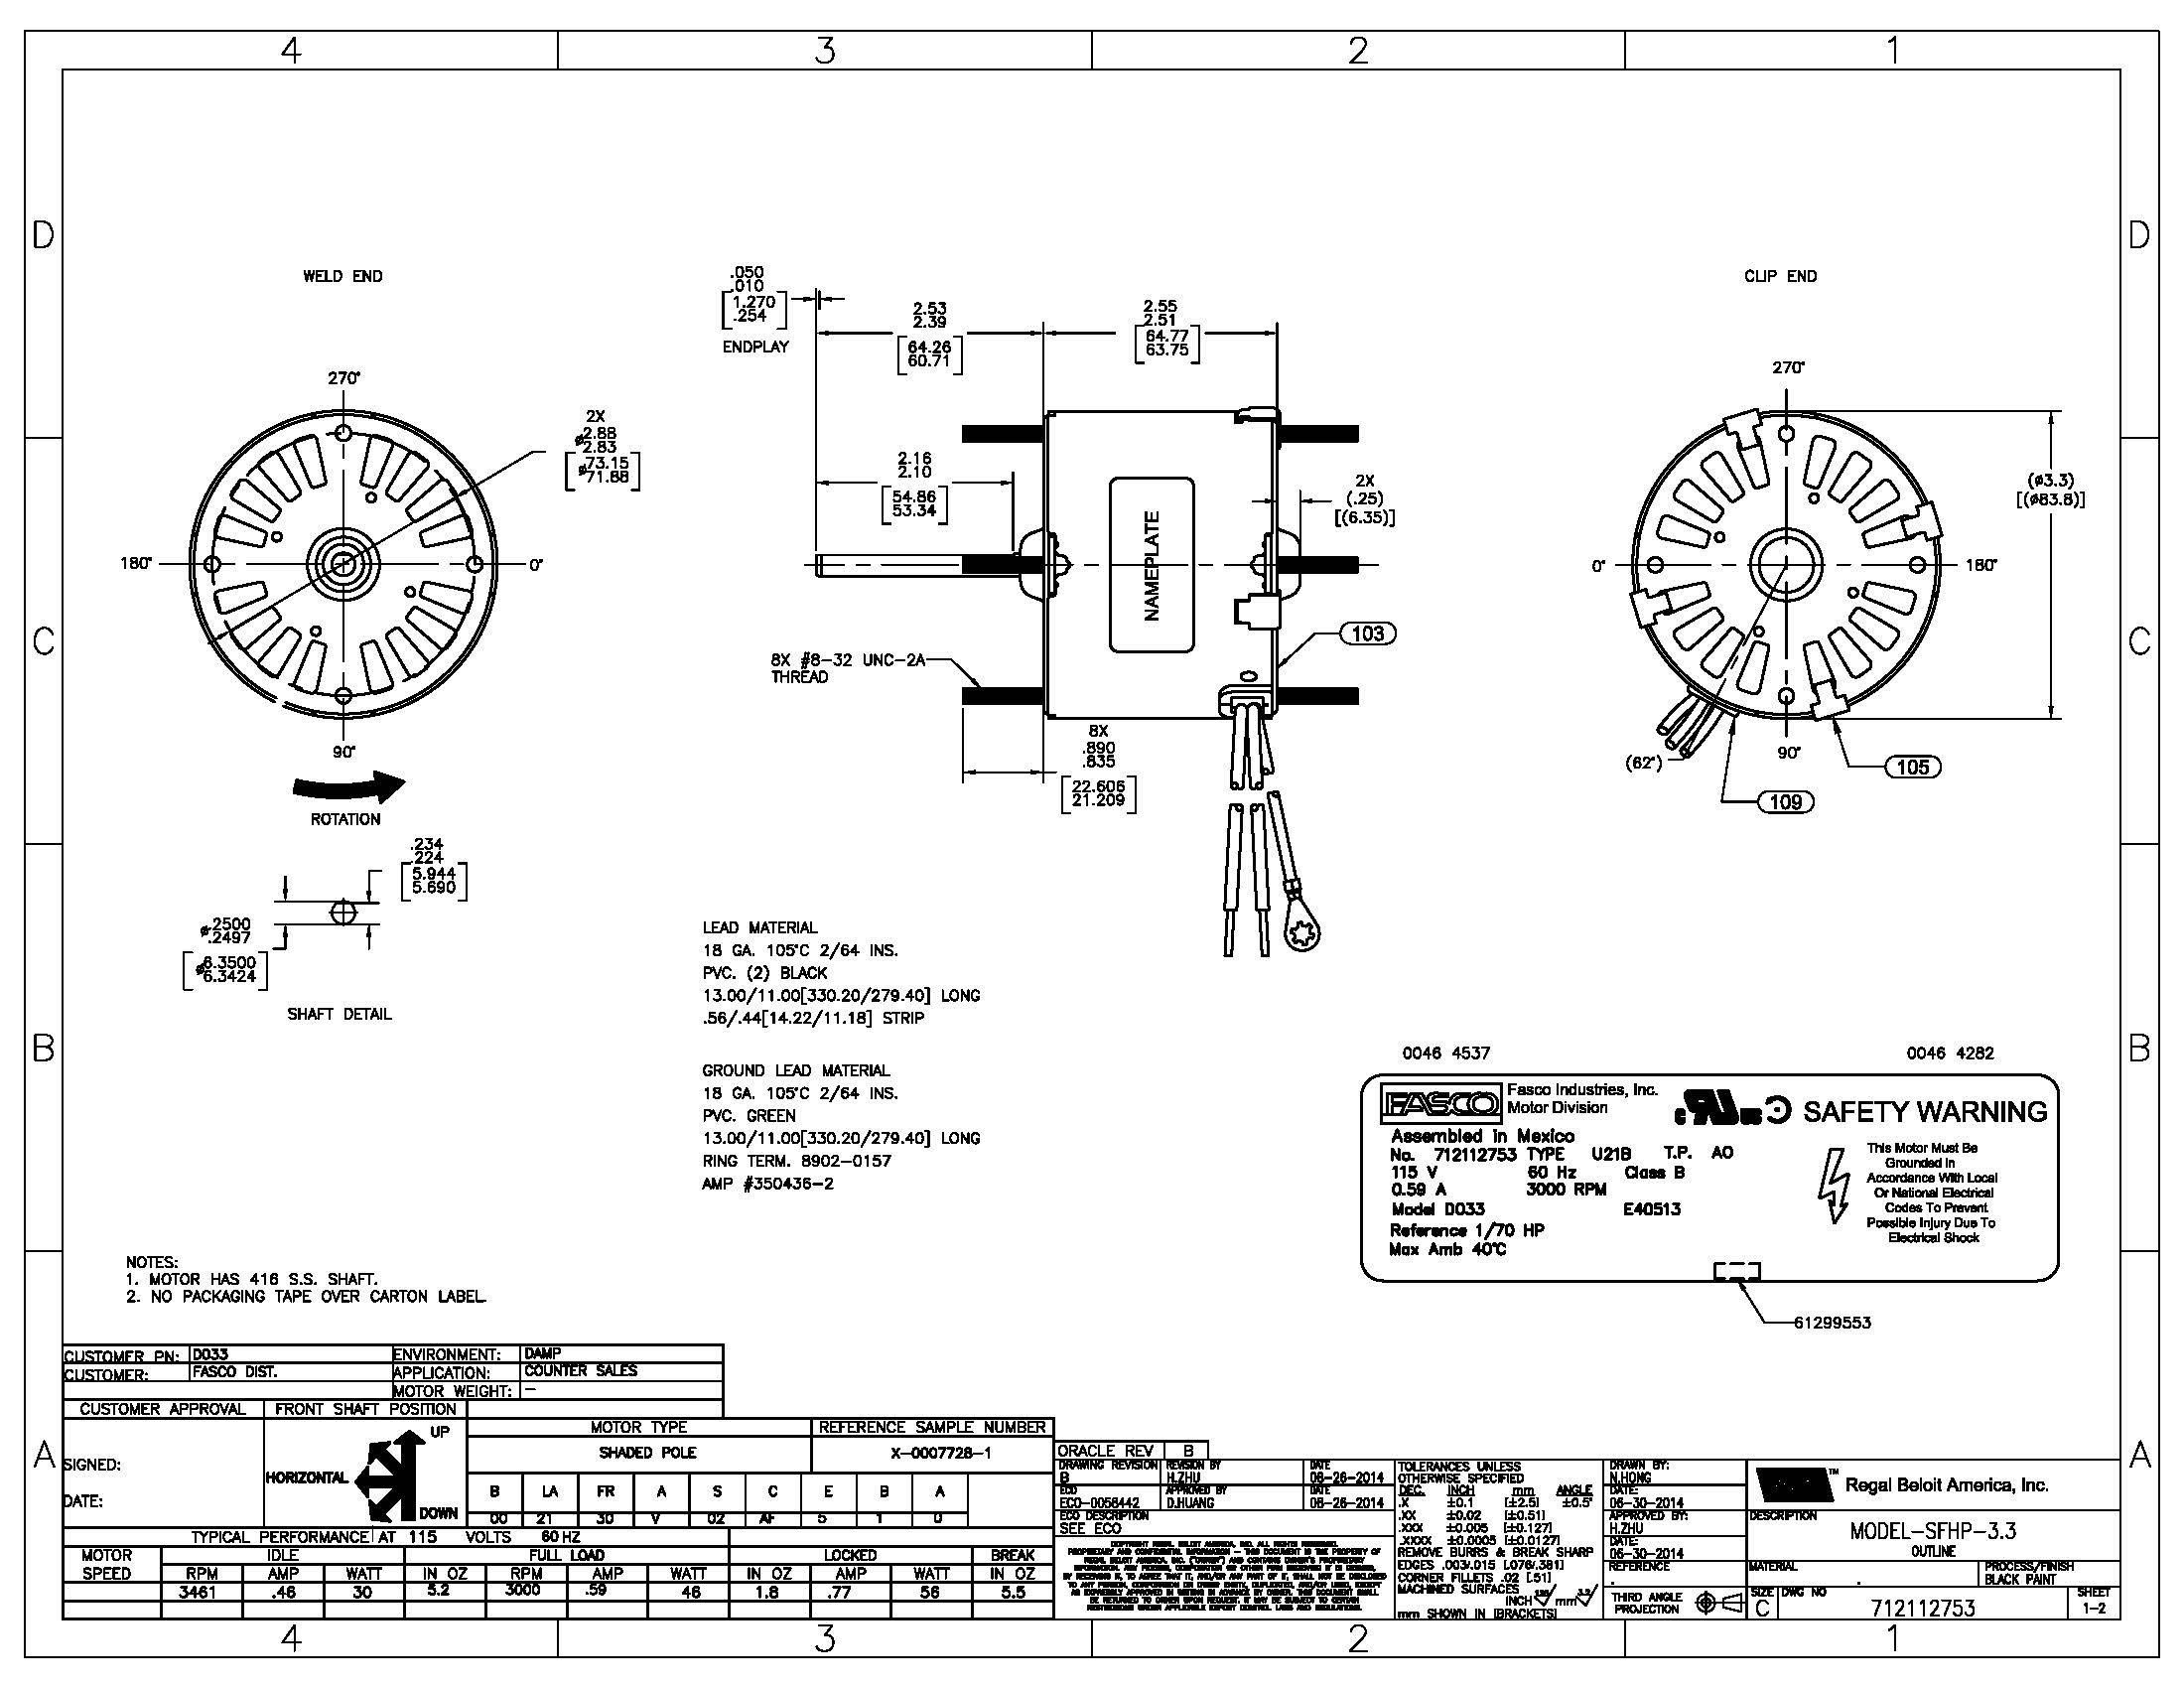 Fasco Motor Wiring Diagram Fasco Motors Wiring Diagram Download Of Fasco Motor Wiring Diagram